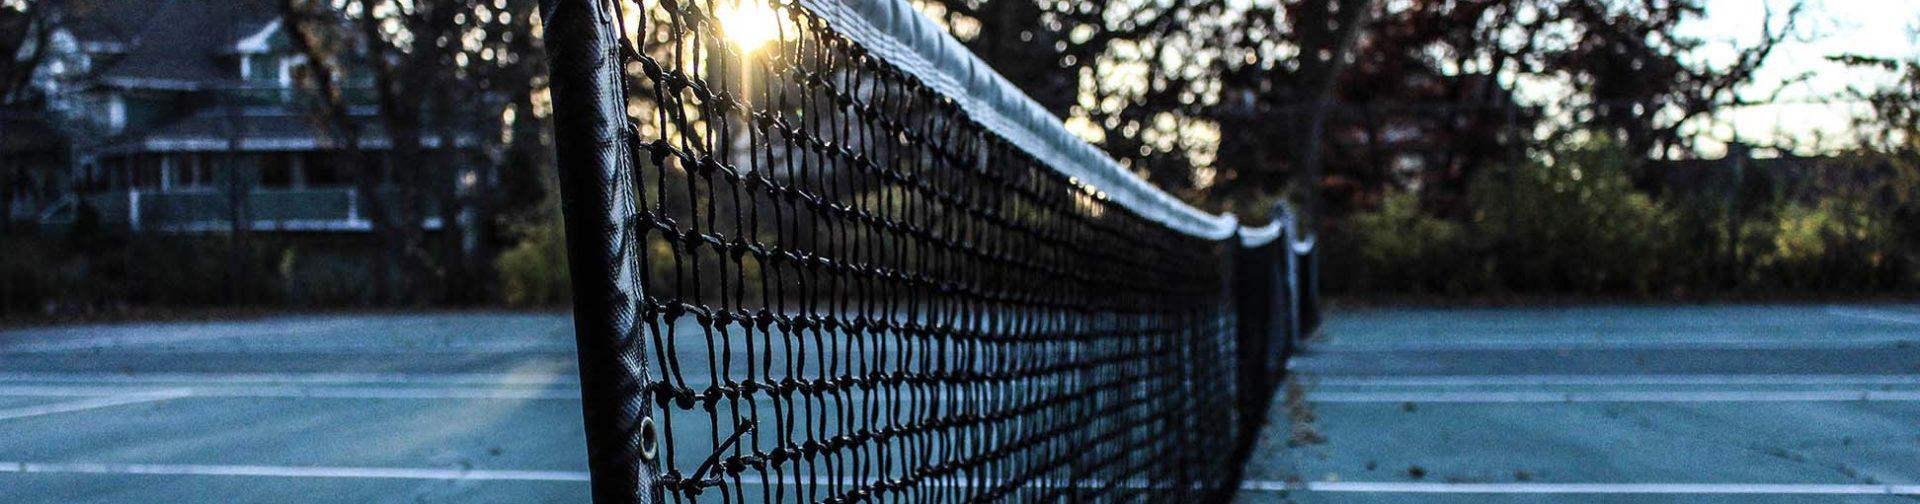 Chattanooga Tennis Association